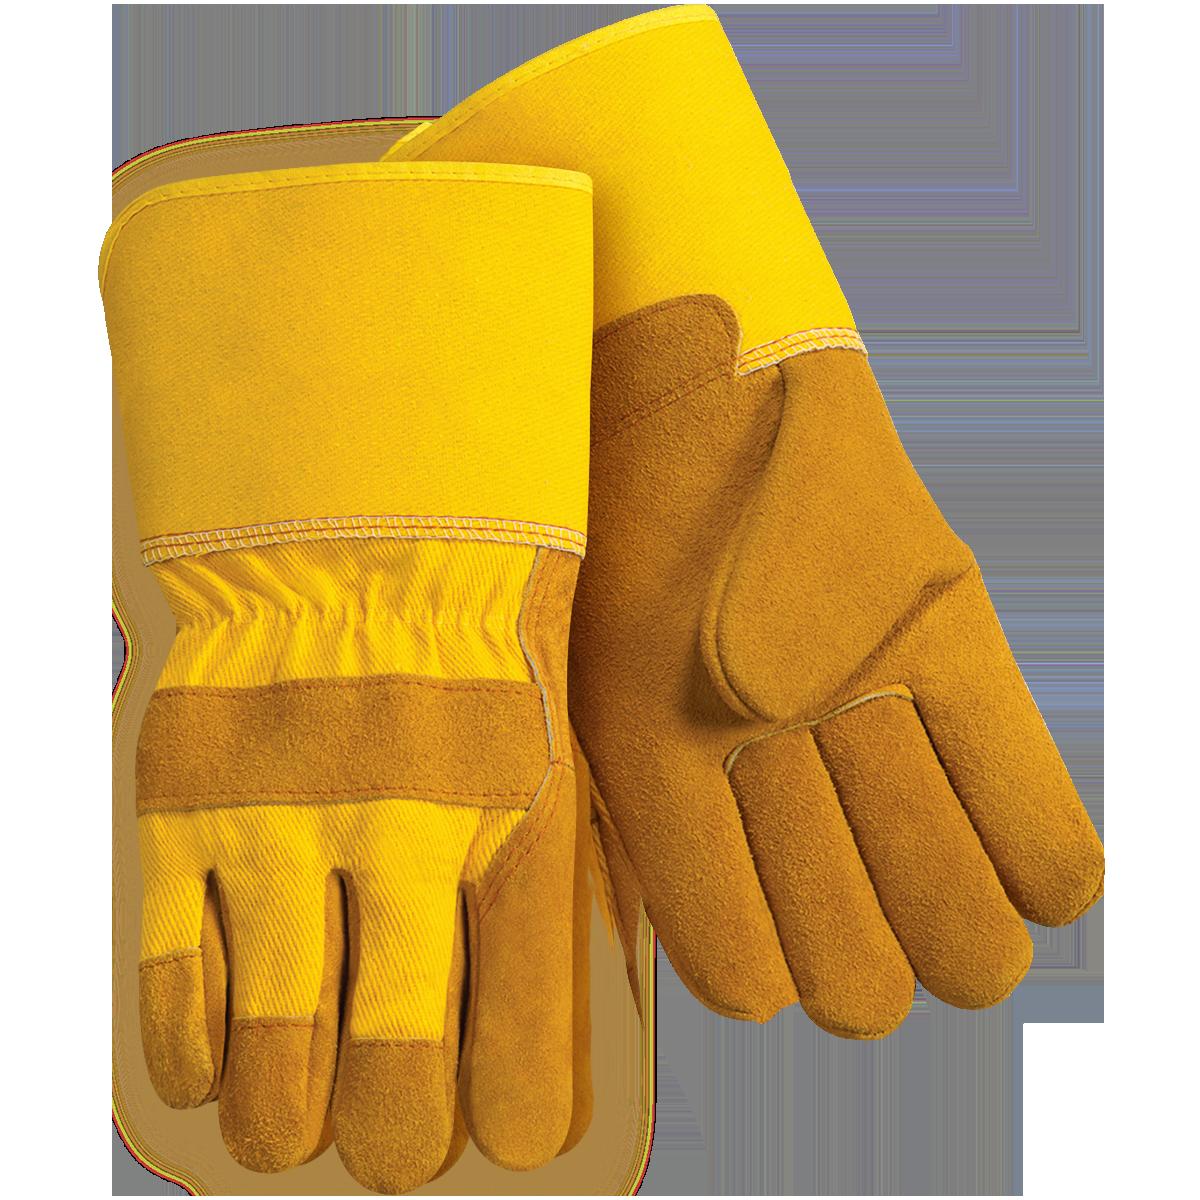 Leather work gloves best - Premium Split Cowhide Leather Palm Work Gloves Long Cuff